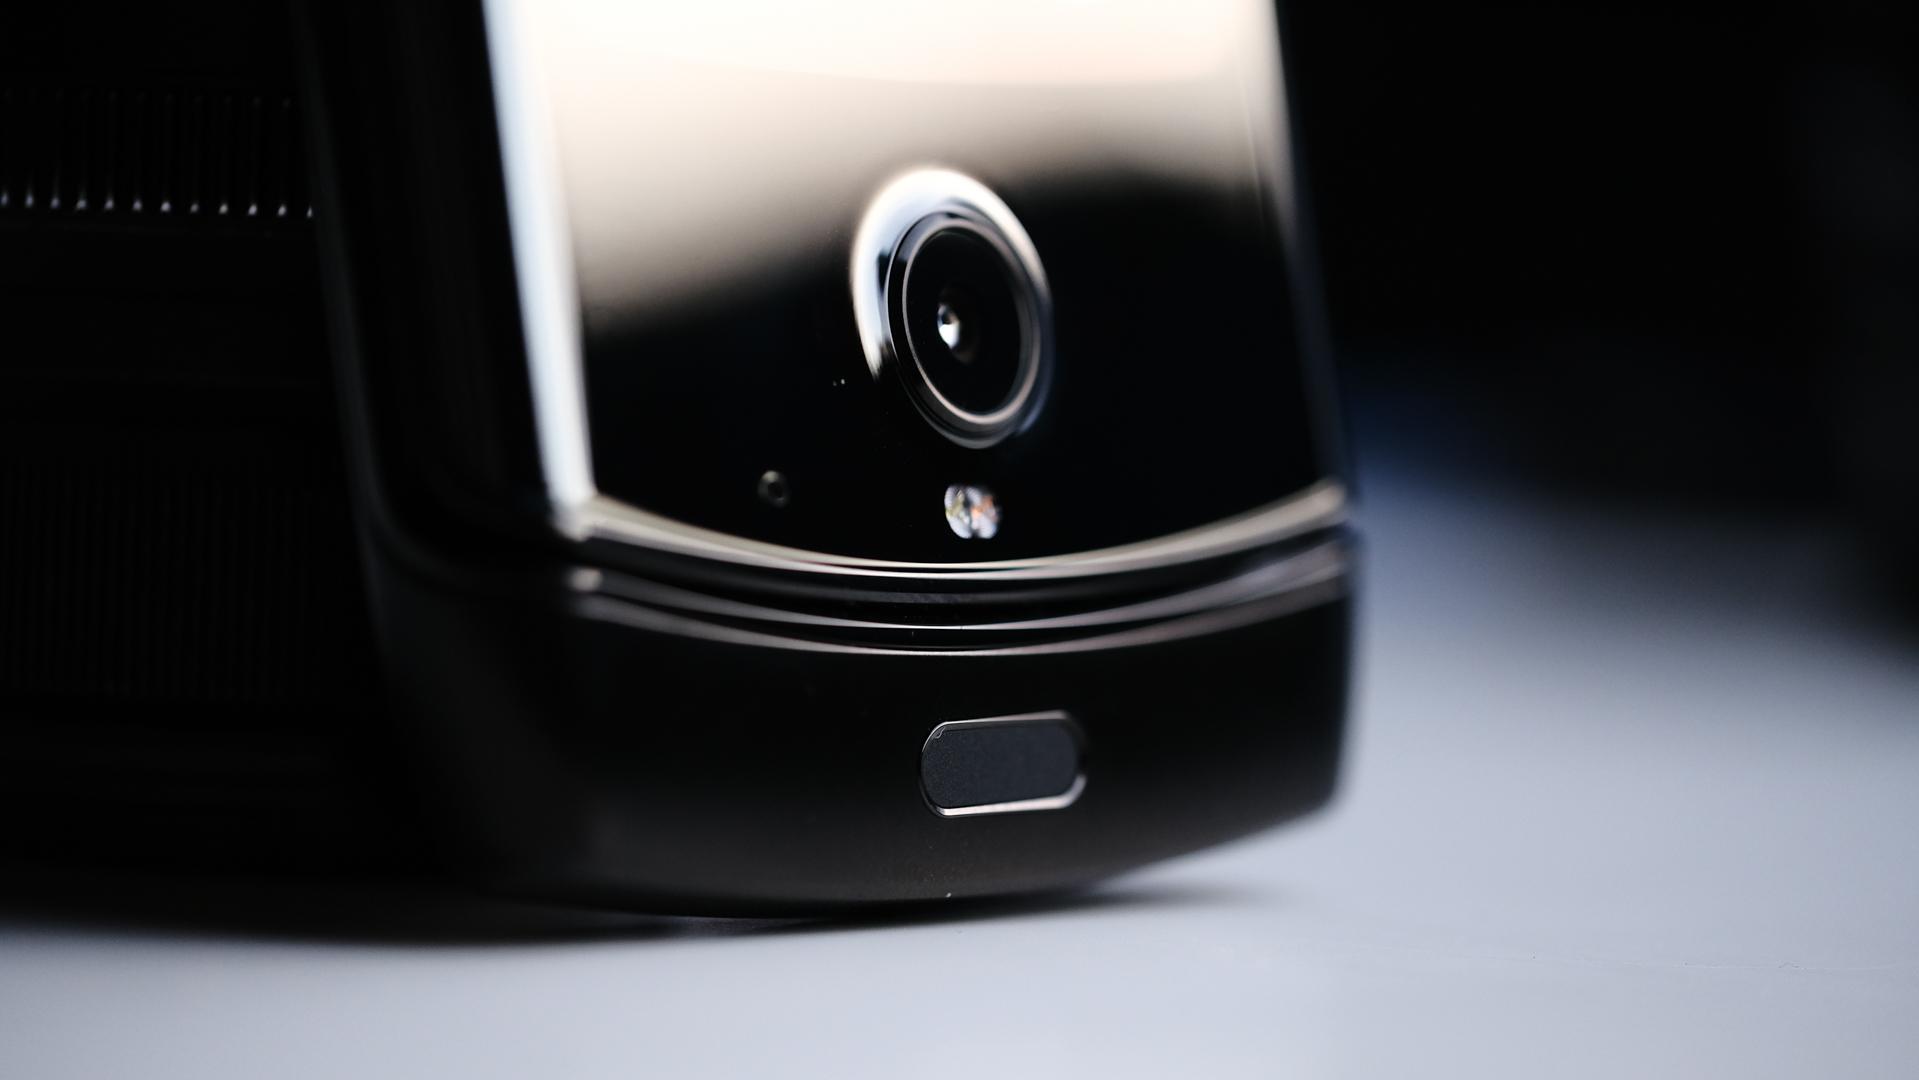 Moto Razr foldable camera and fingerprint reader macro